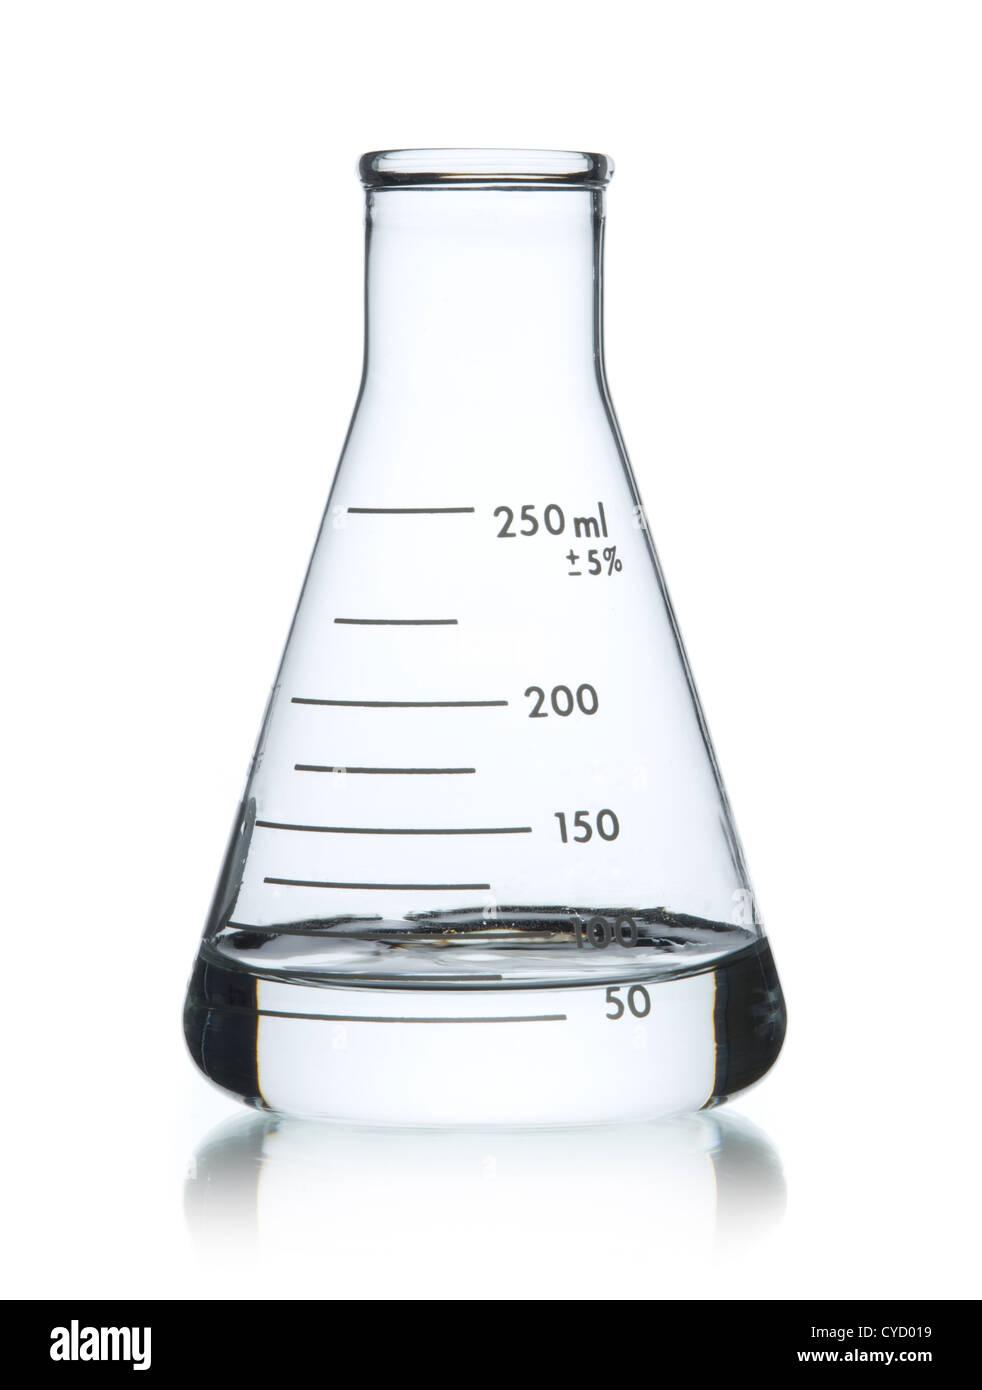 Glass Erlenmeyer Flask, 250 ml - Stock Image